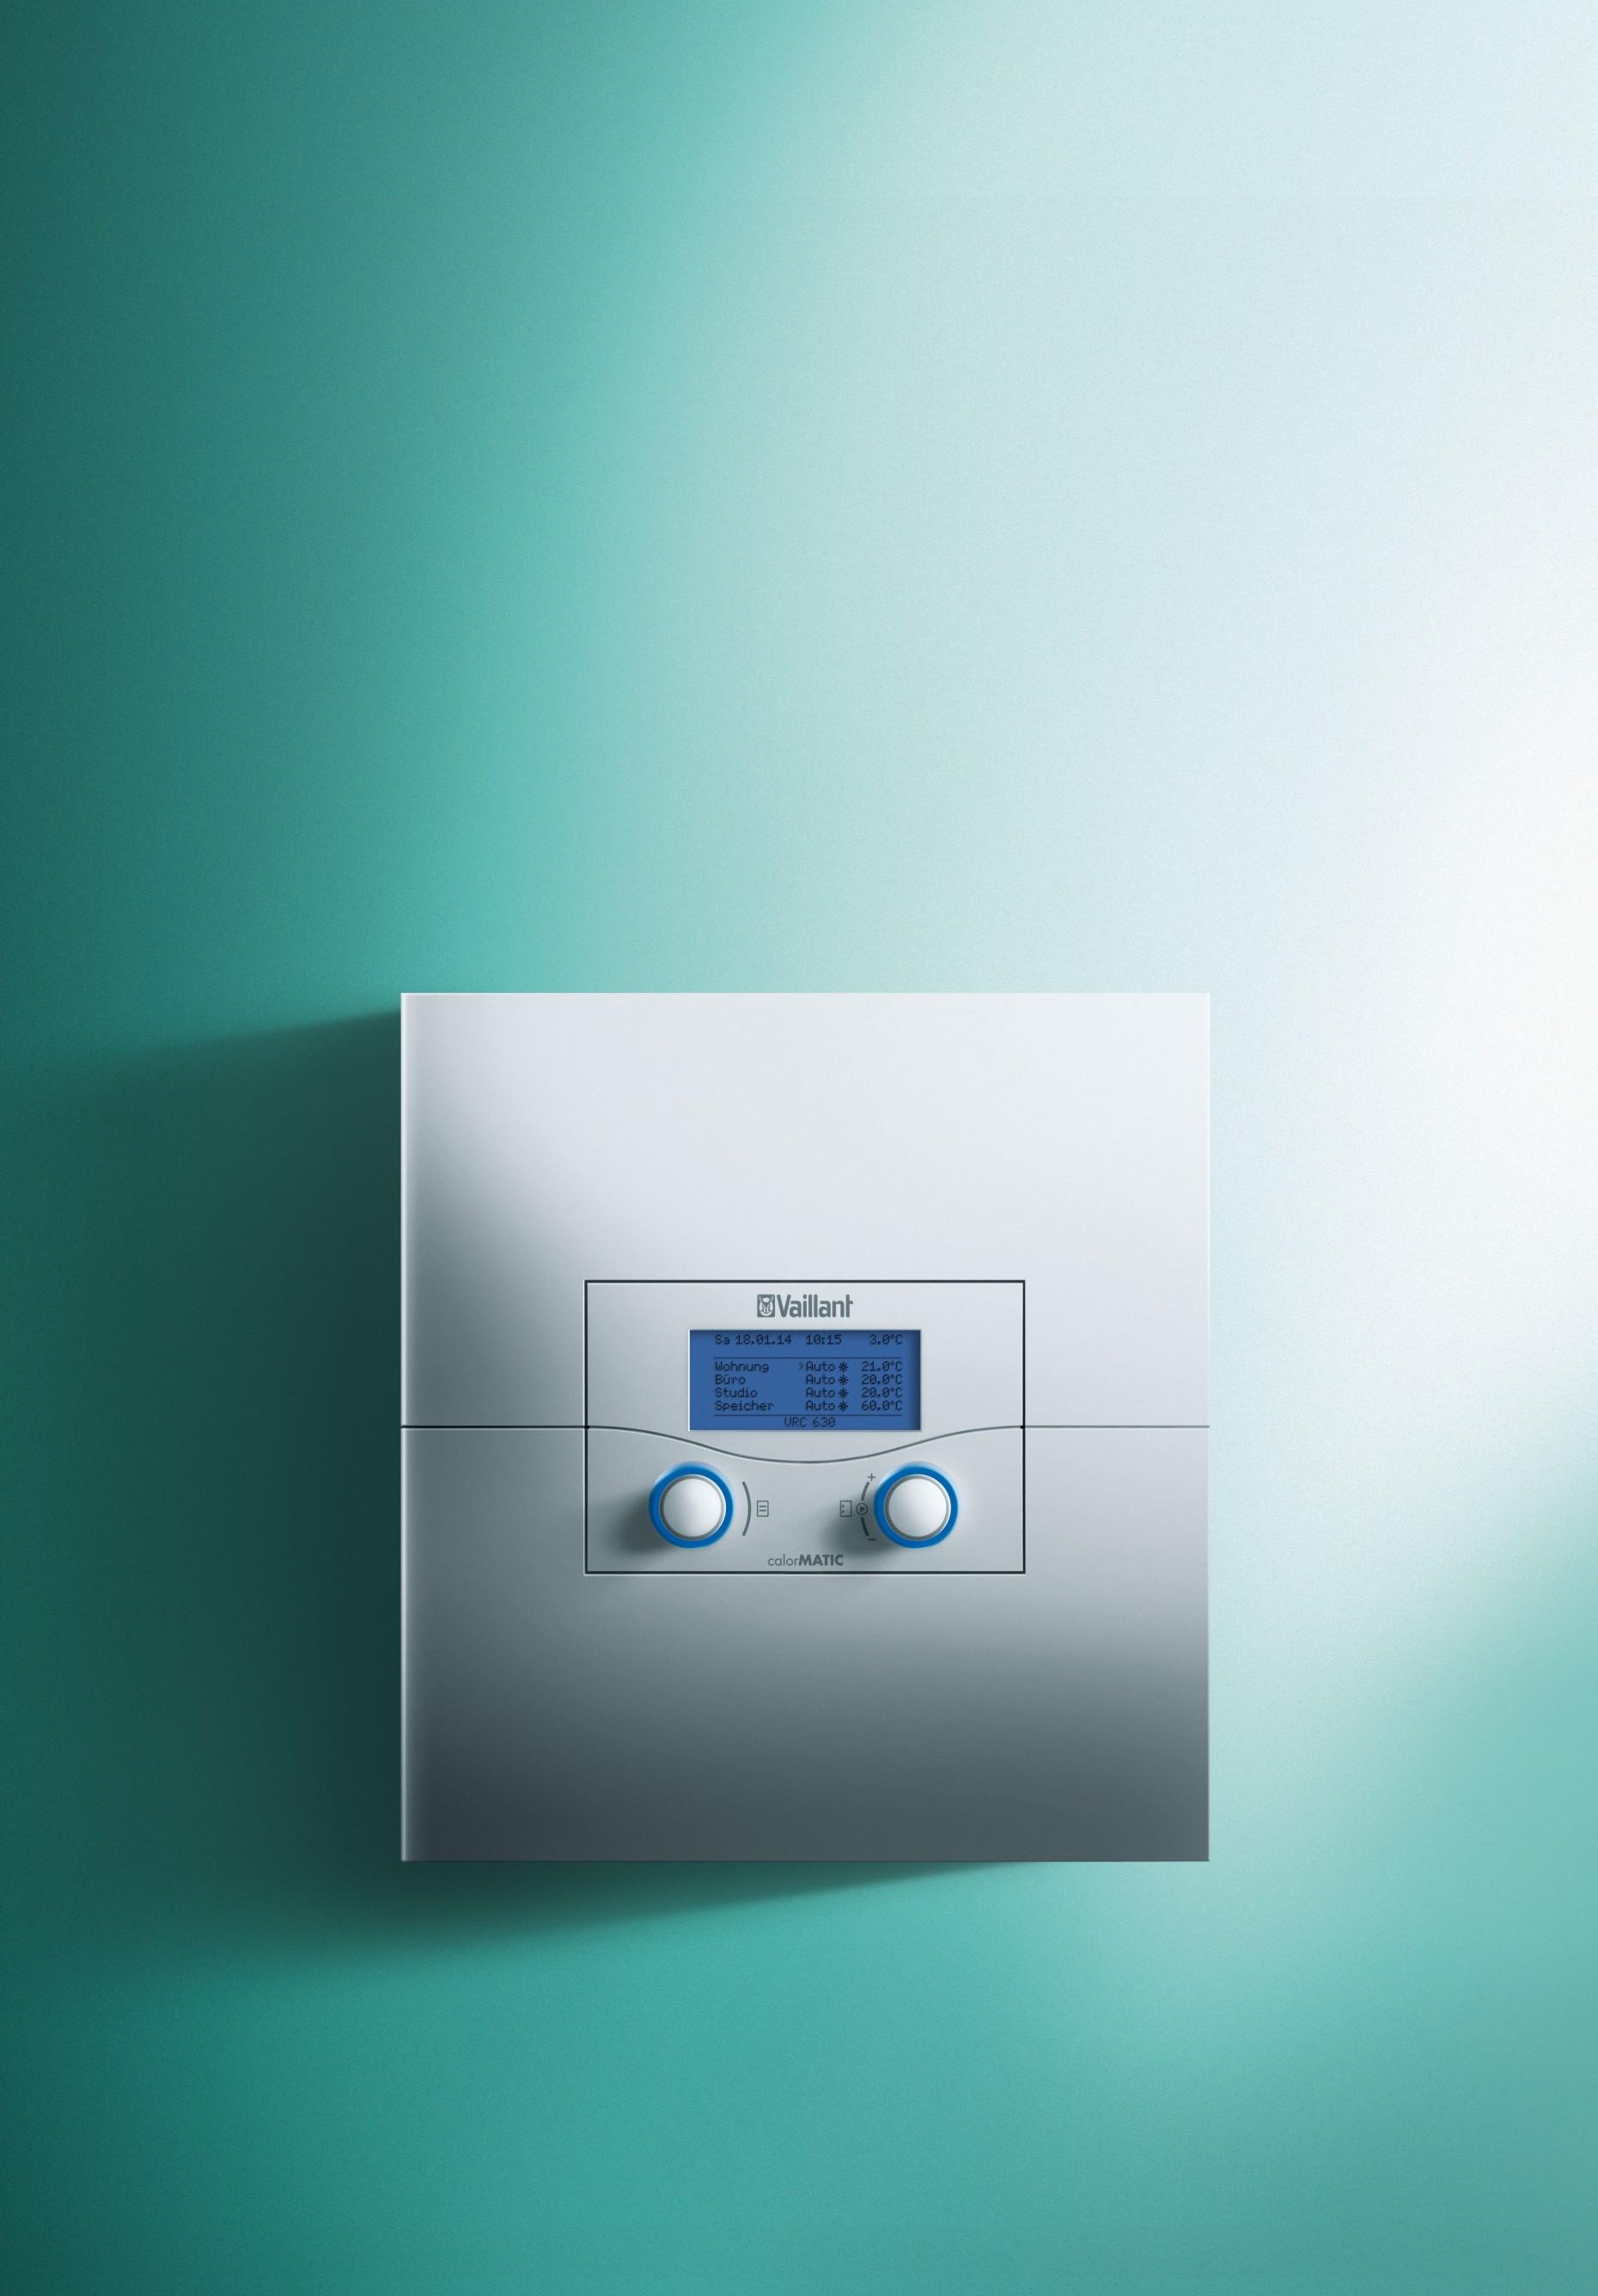 regelungssystem calormatic 630 3 produktinfos vaillant. Black Bedroom Furniture Sets. Home Design Ideas